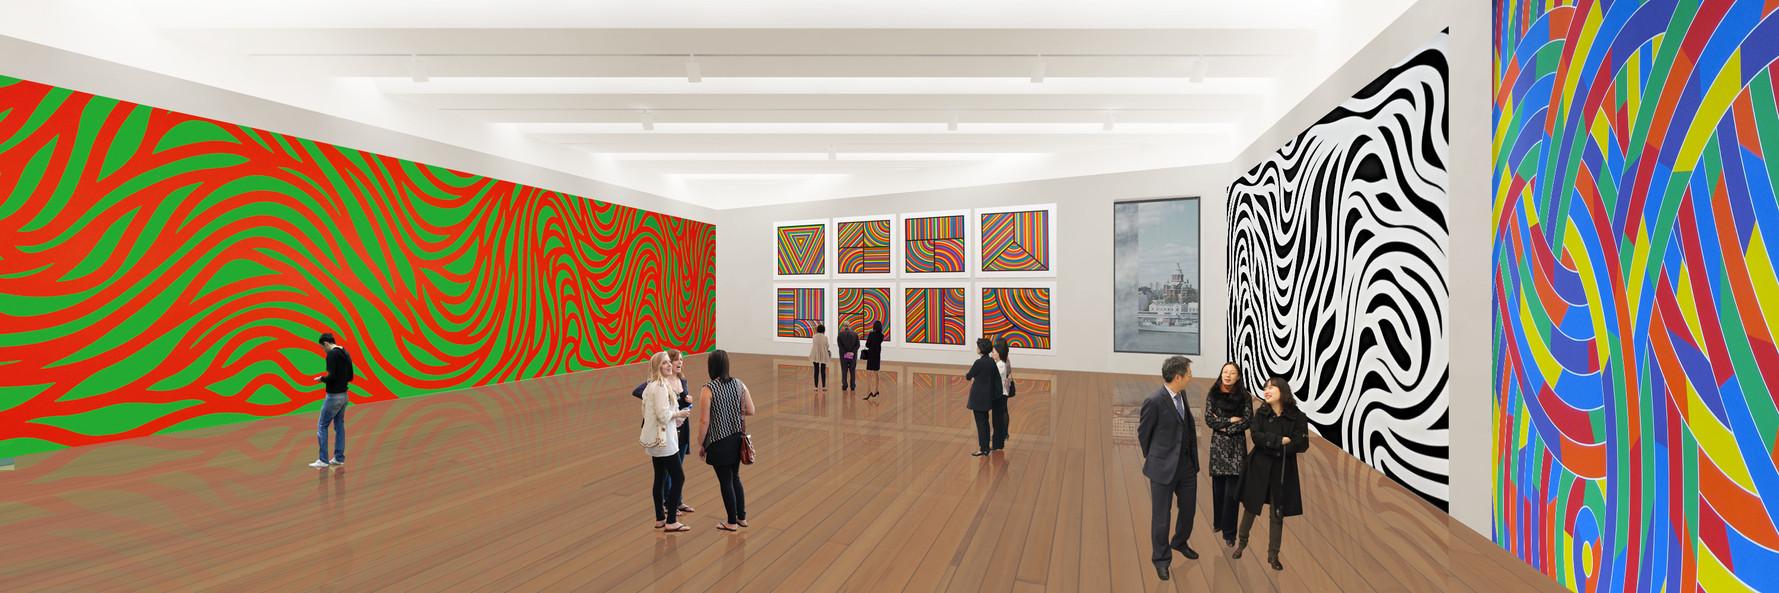 Guggenheim Interior 1 Render Final.jpg